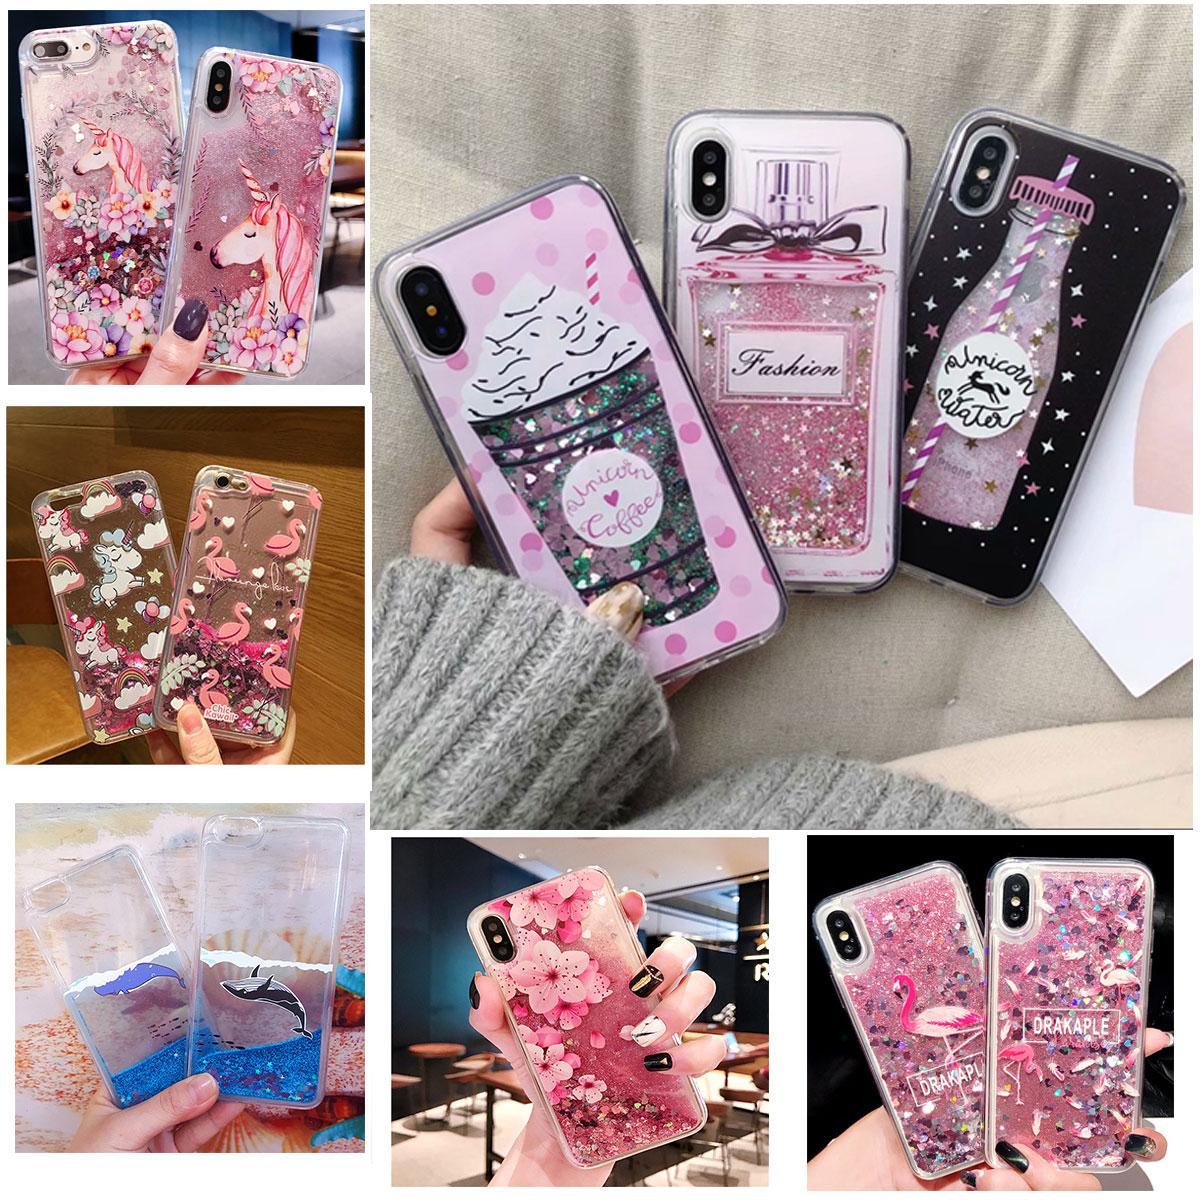 Liquid-Water-Case Phone-Cases Unicorn Soft-Silicone-Cover Minnie Note 3 Mix 2s Xiaomi 5